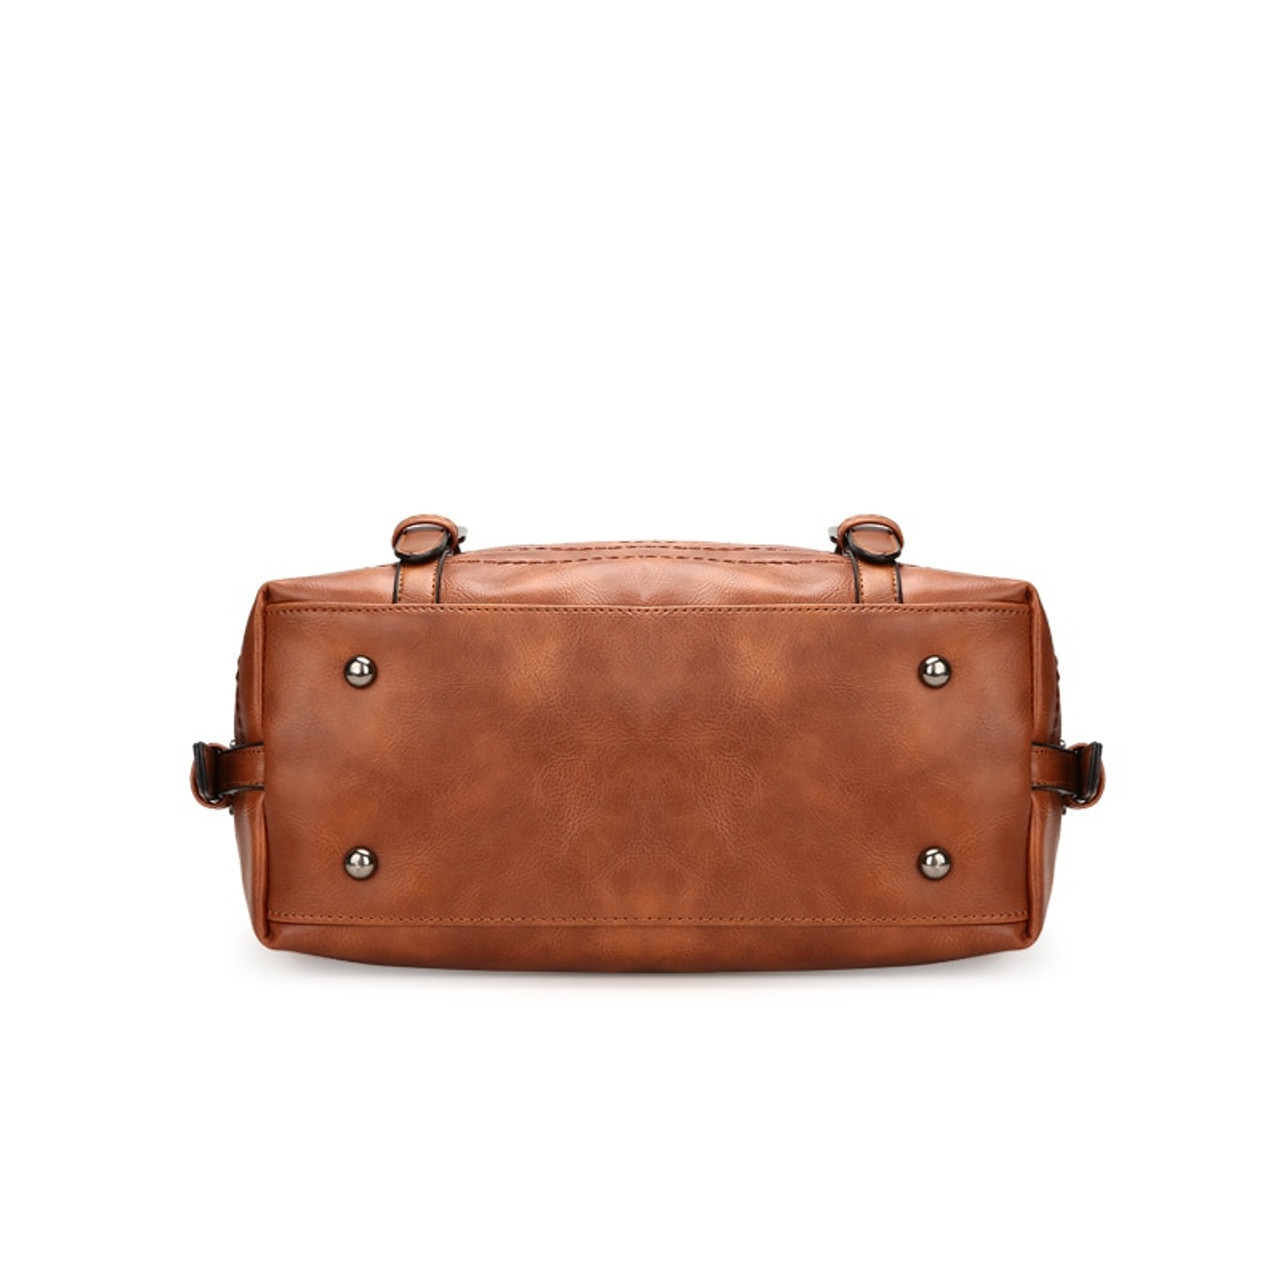 efc4355378 ... Brown Vintage Fashion Casual Tote Boston Bags Handbags Women Famous  Brands Luxury Pu Leather Women Bag ...